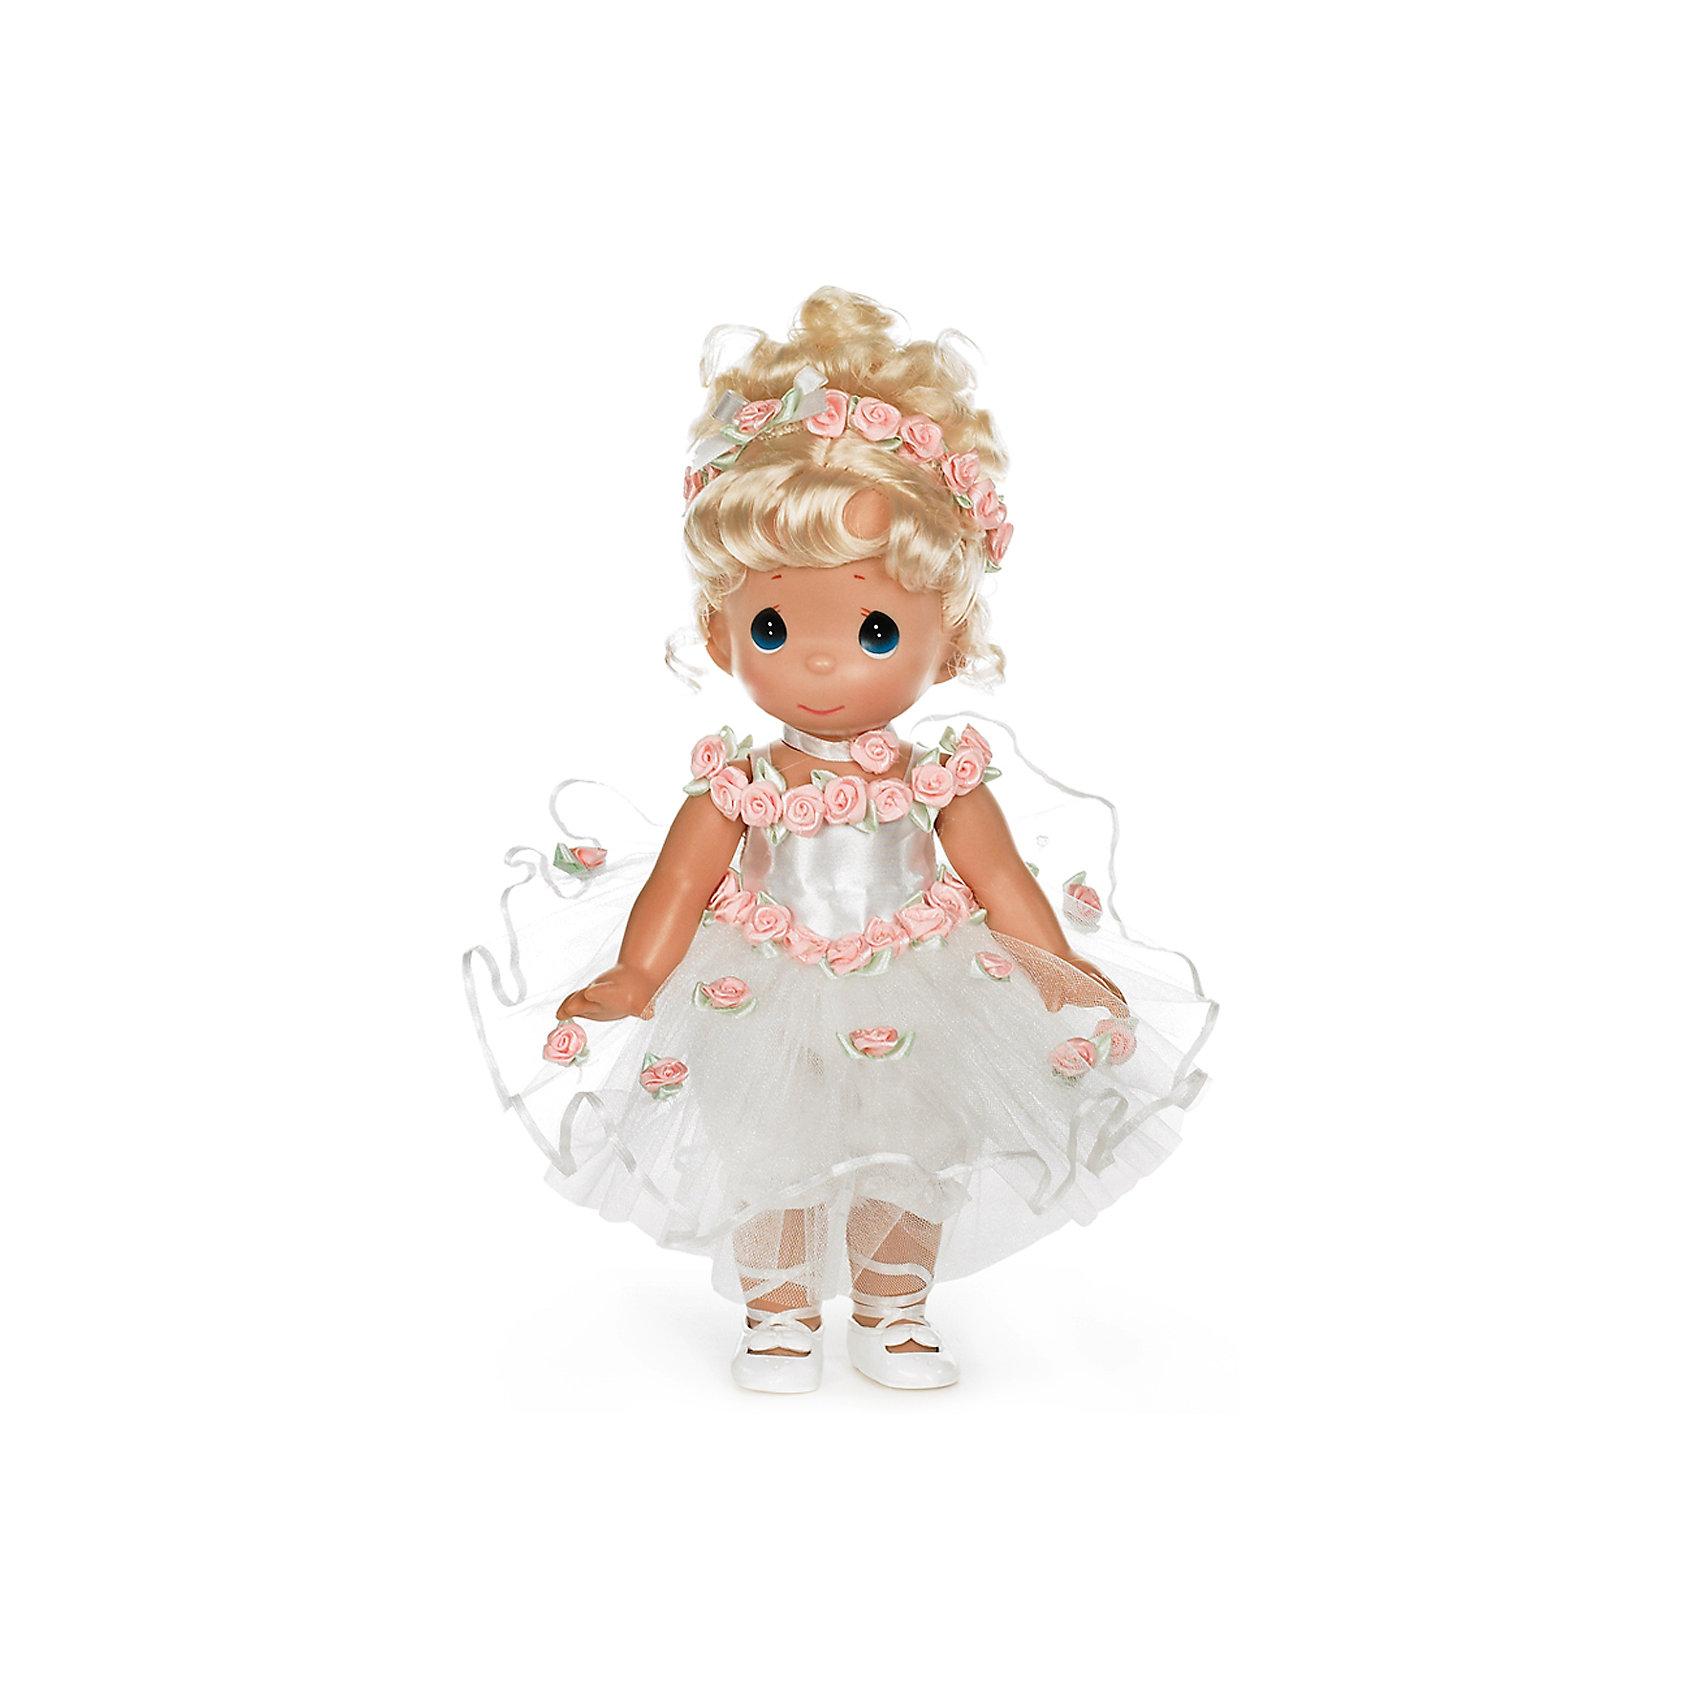 Кукла Танец в сердце, блондинка, 30 см, Precious MomentsКлассические куклы<br><br><br>Ширина мм: 140<br>Глубина мм: 300<br>Высота мм: 80<br>Вес г: 428<br>Возраст от месяцев: 36<br>Возраст до месяцев: 2147483647<br>Пол: Женский<br>Возраст: Детский<br>SKU: 5482501